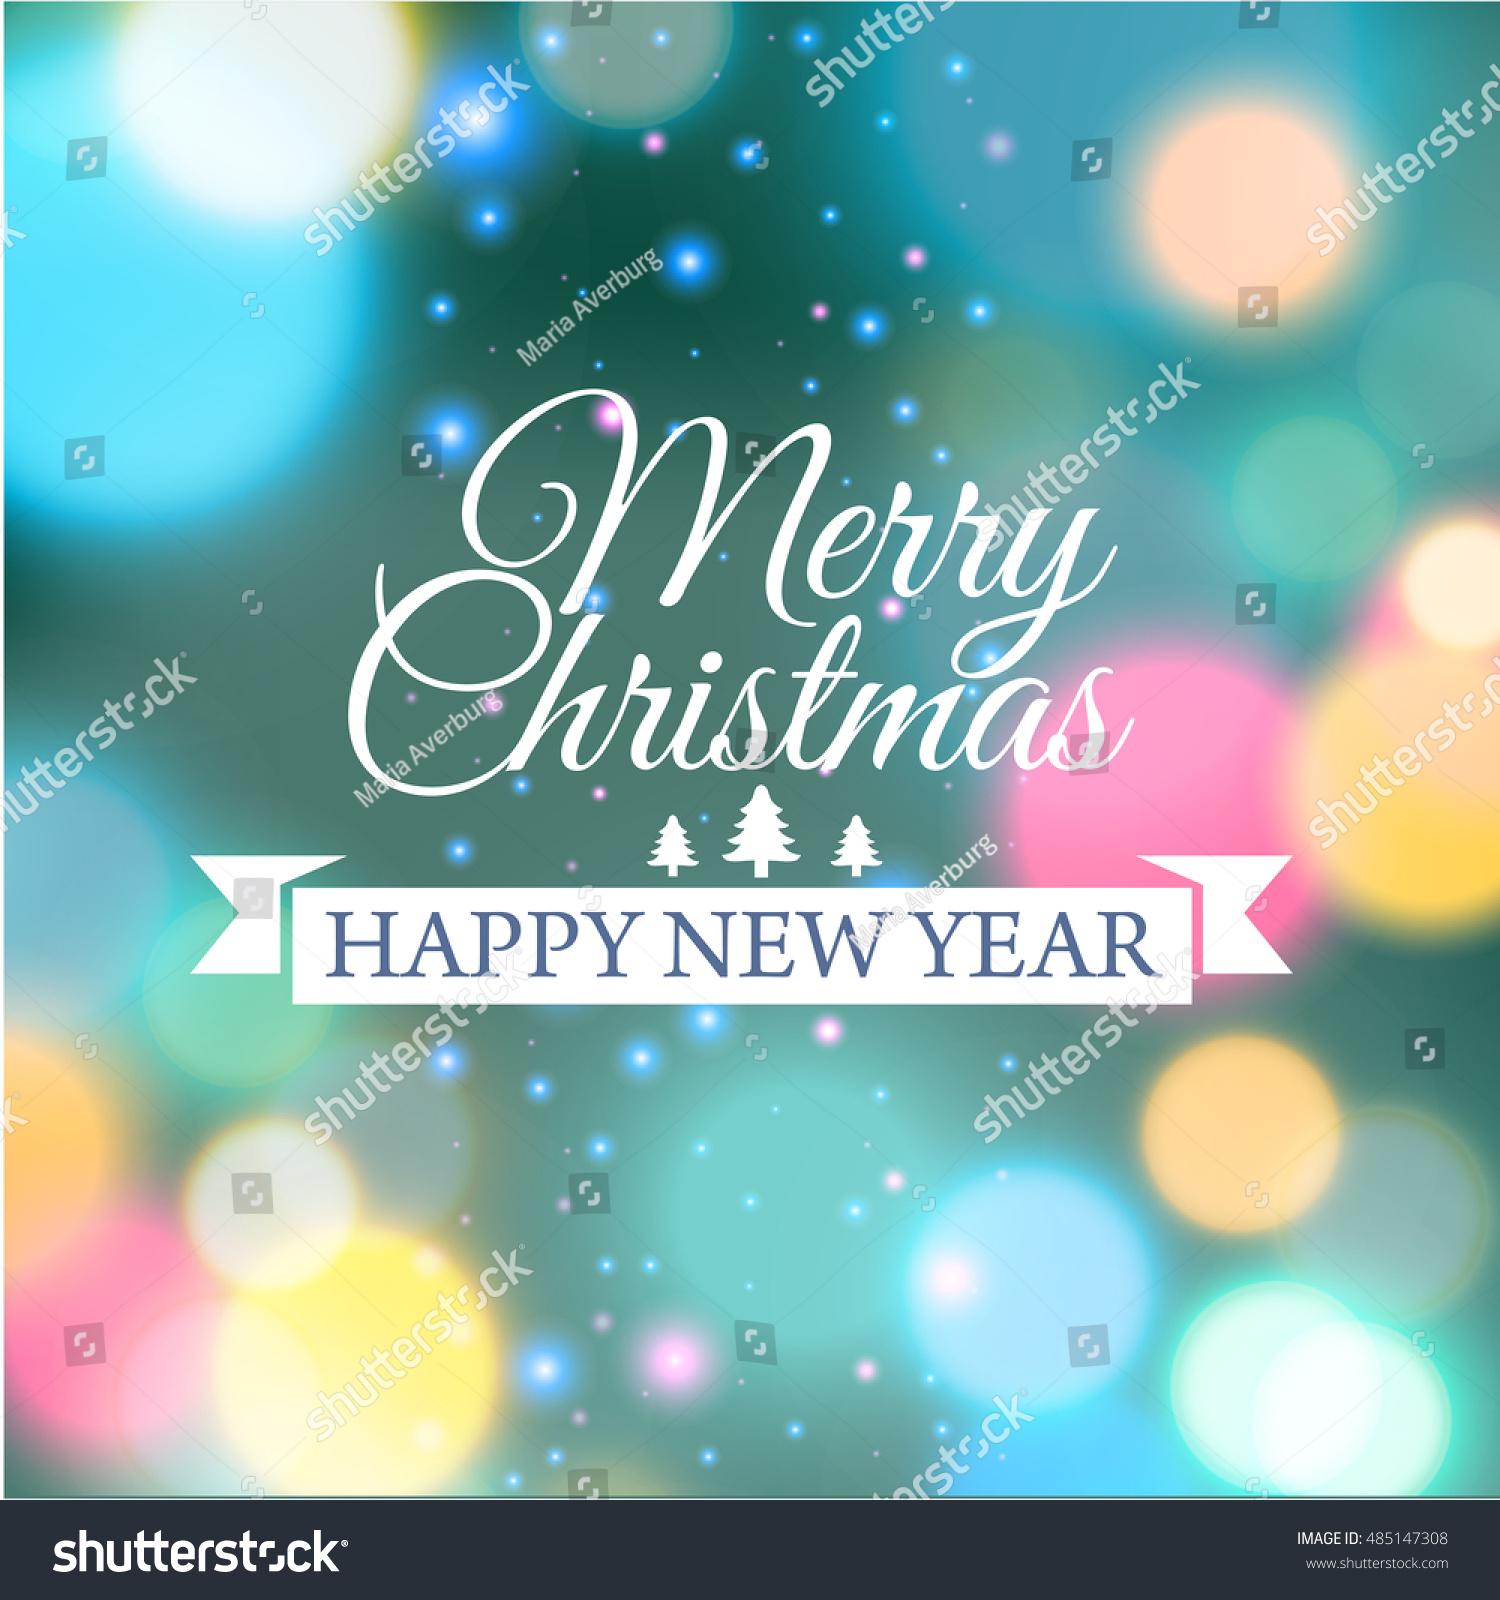 Merry Christmas Ecard Template Vector Illustration Stock Vector ...